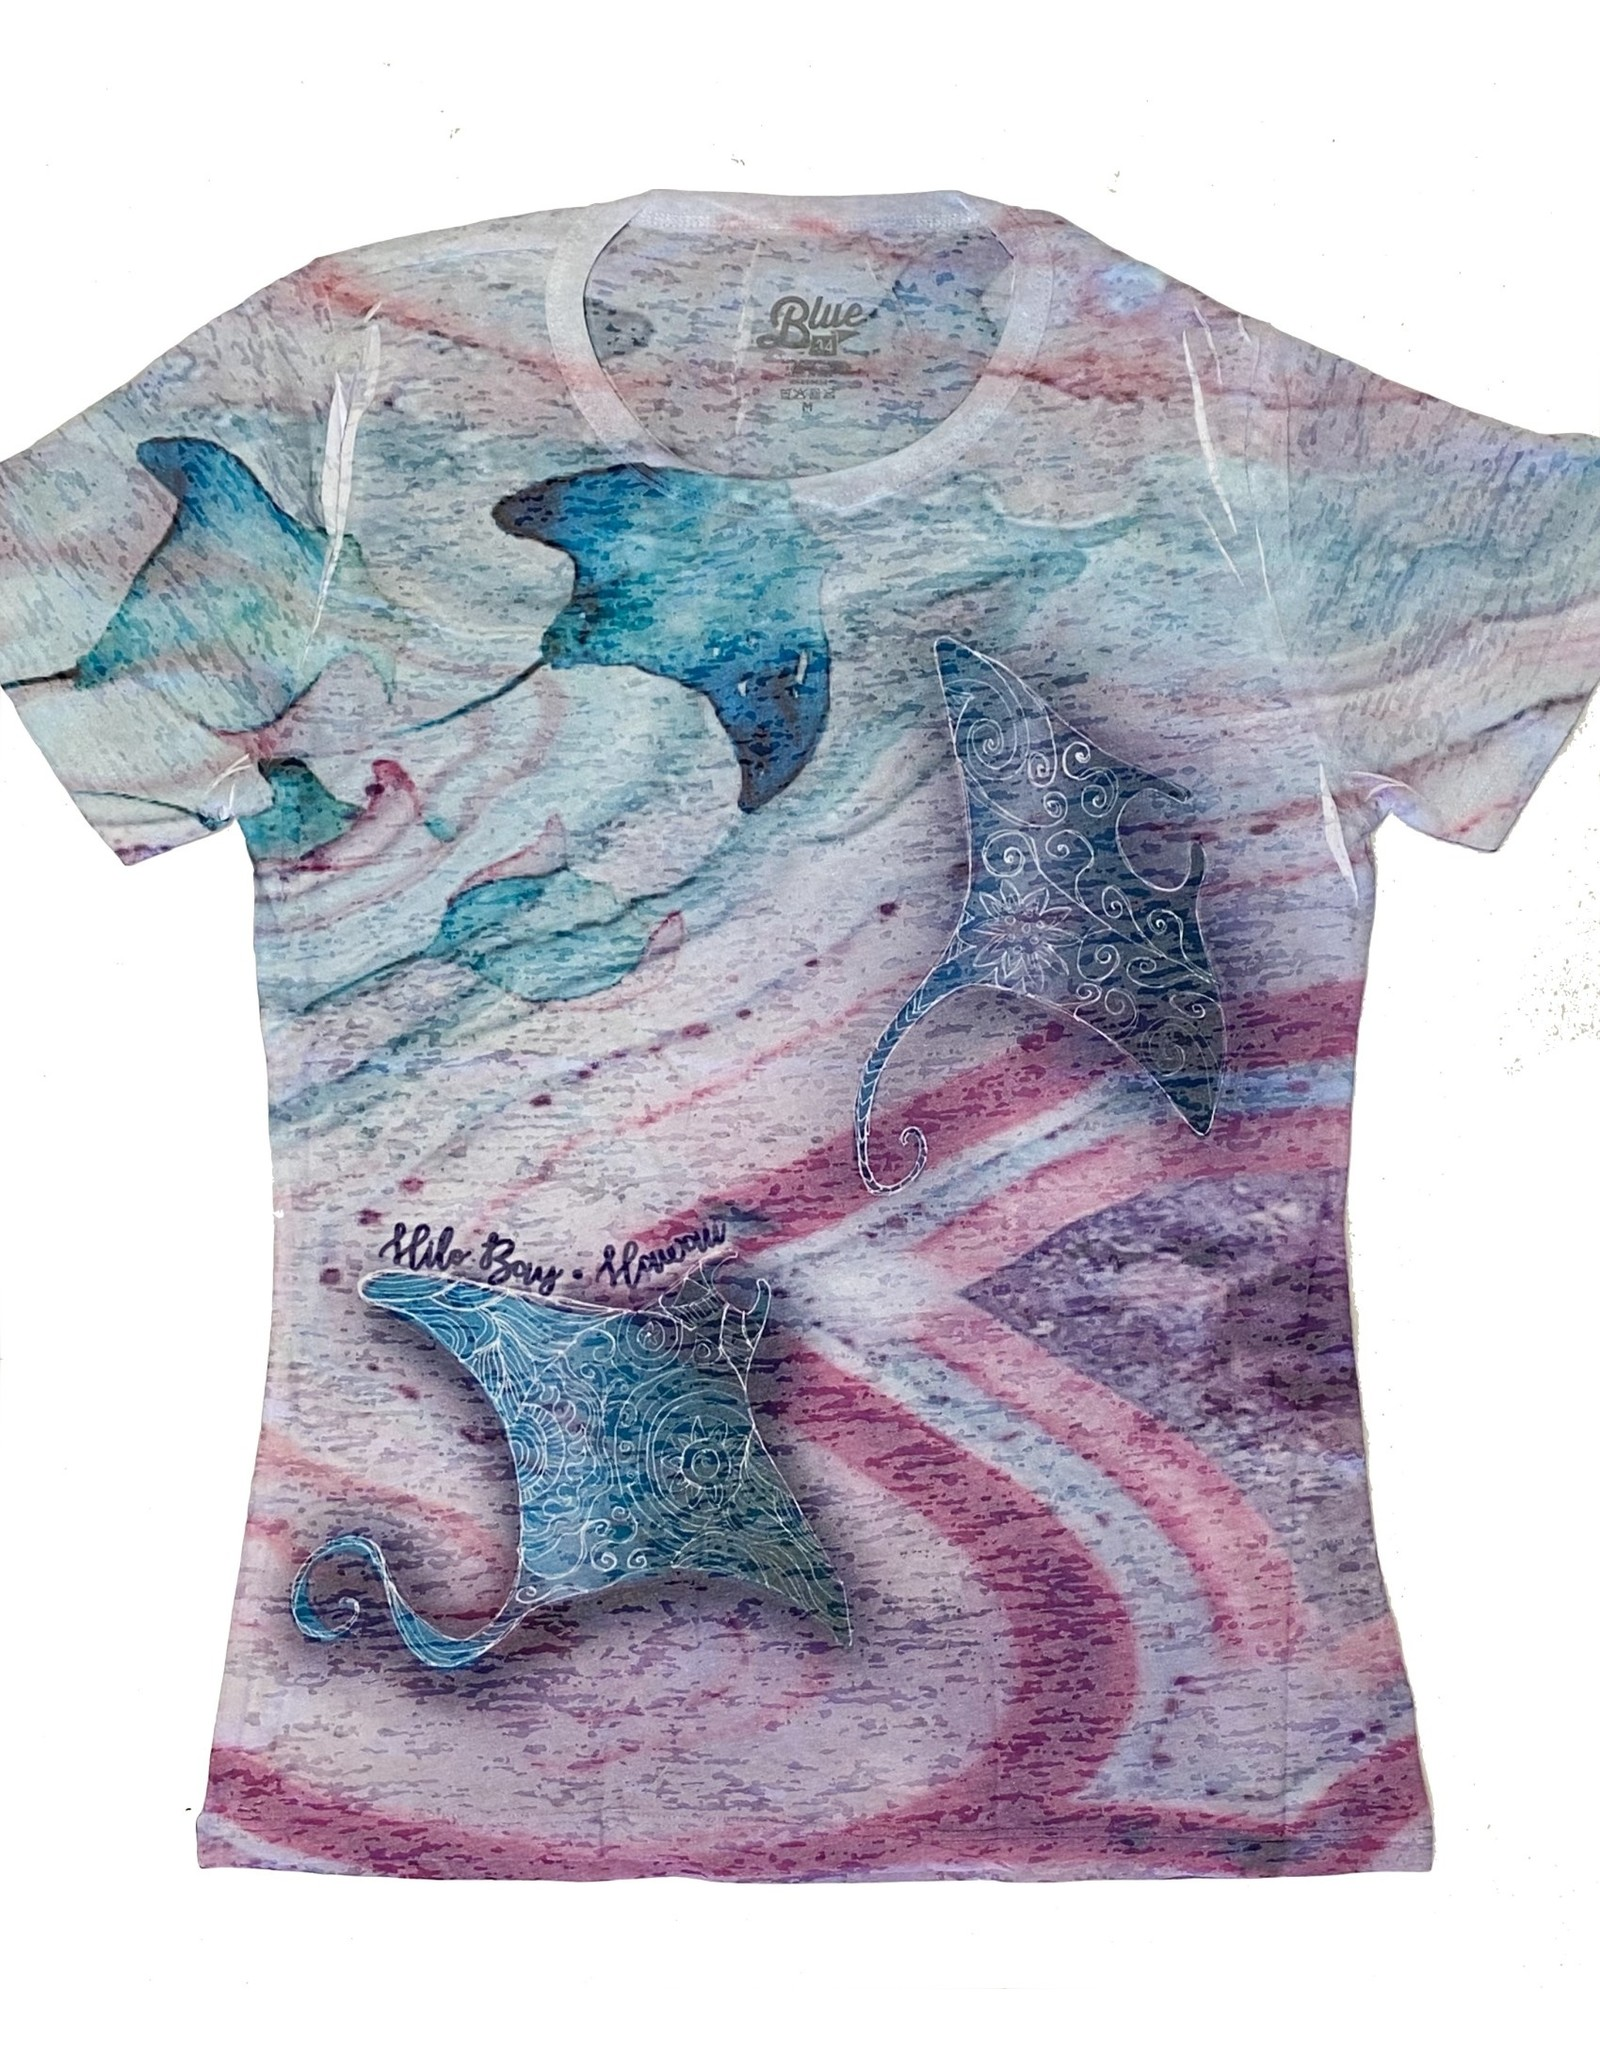 Blue 84 Gifting Manta Rays Ladies Burnout T-shirt